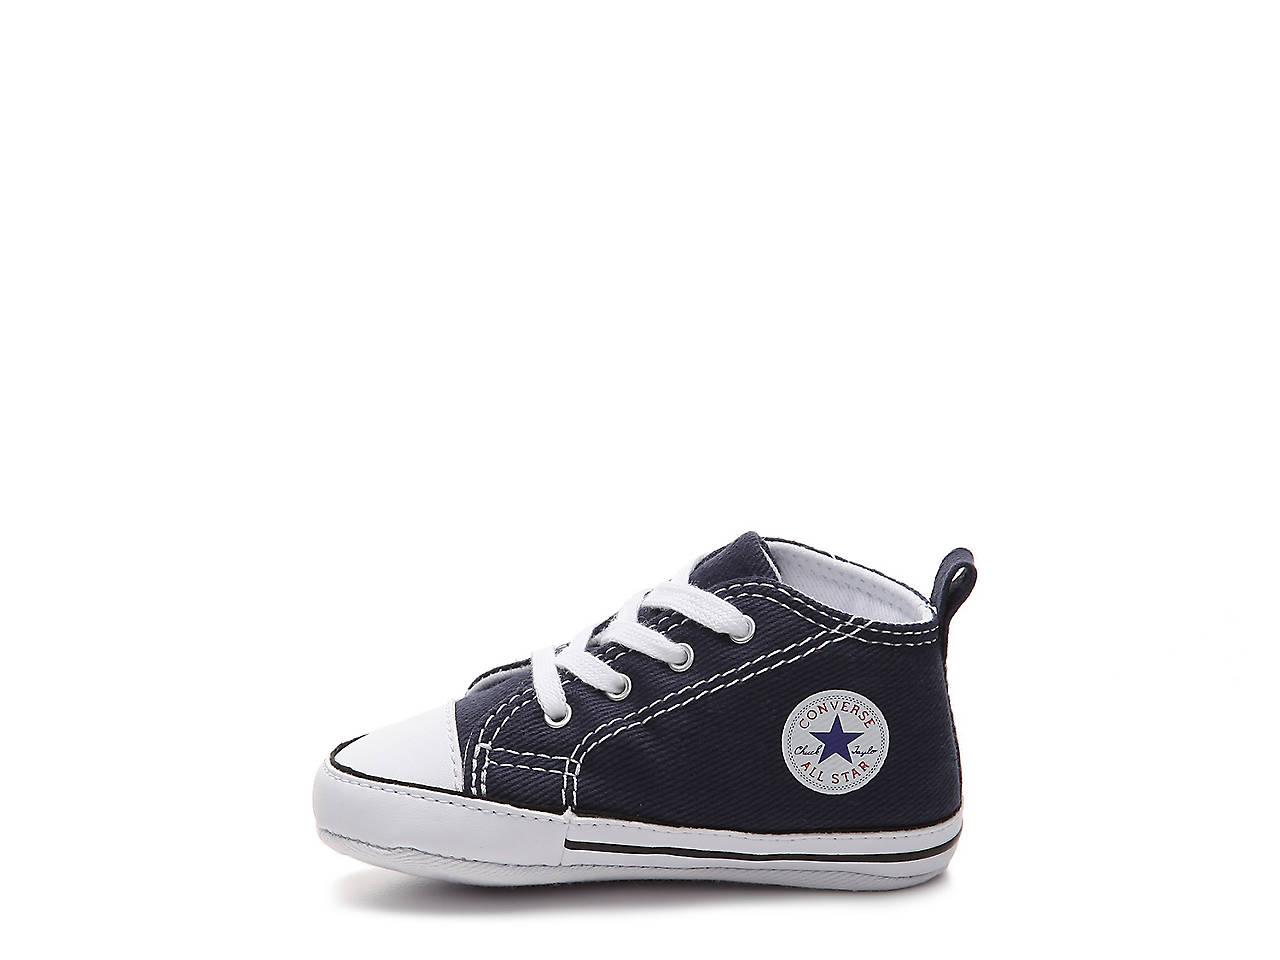 7084c60a29 Converse Chuck Taylor All Star First Star Infant Crib Shoe Kids ...